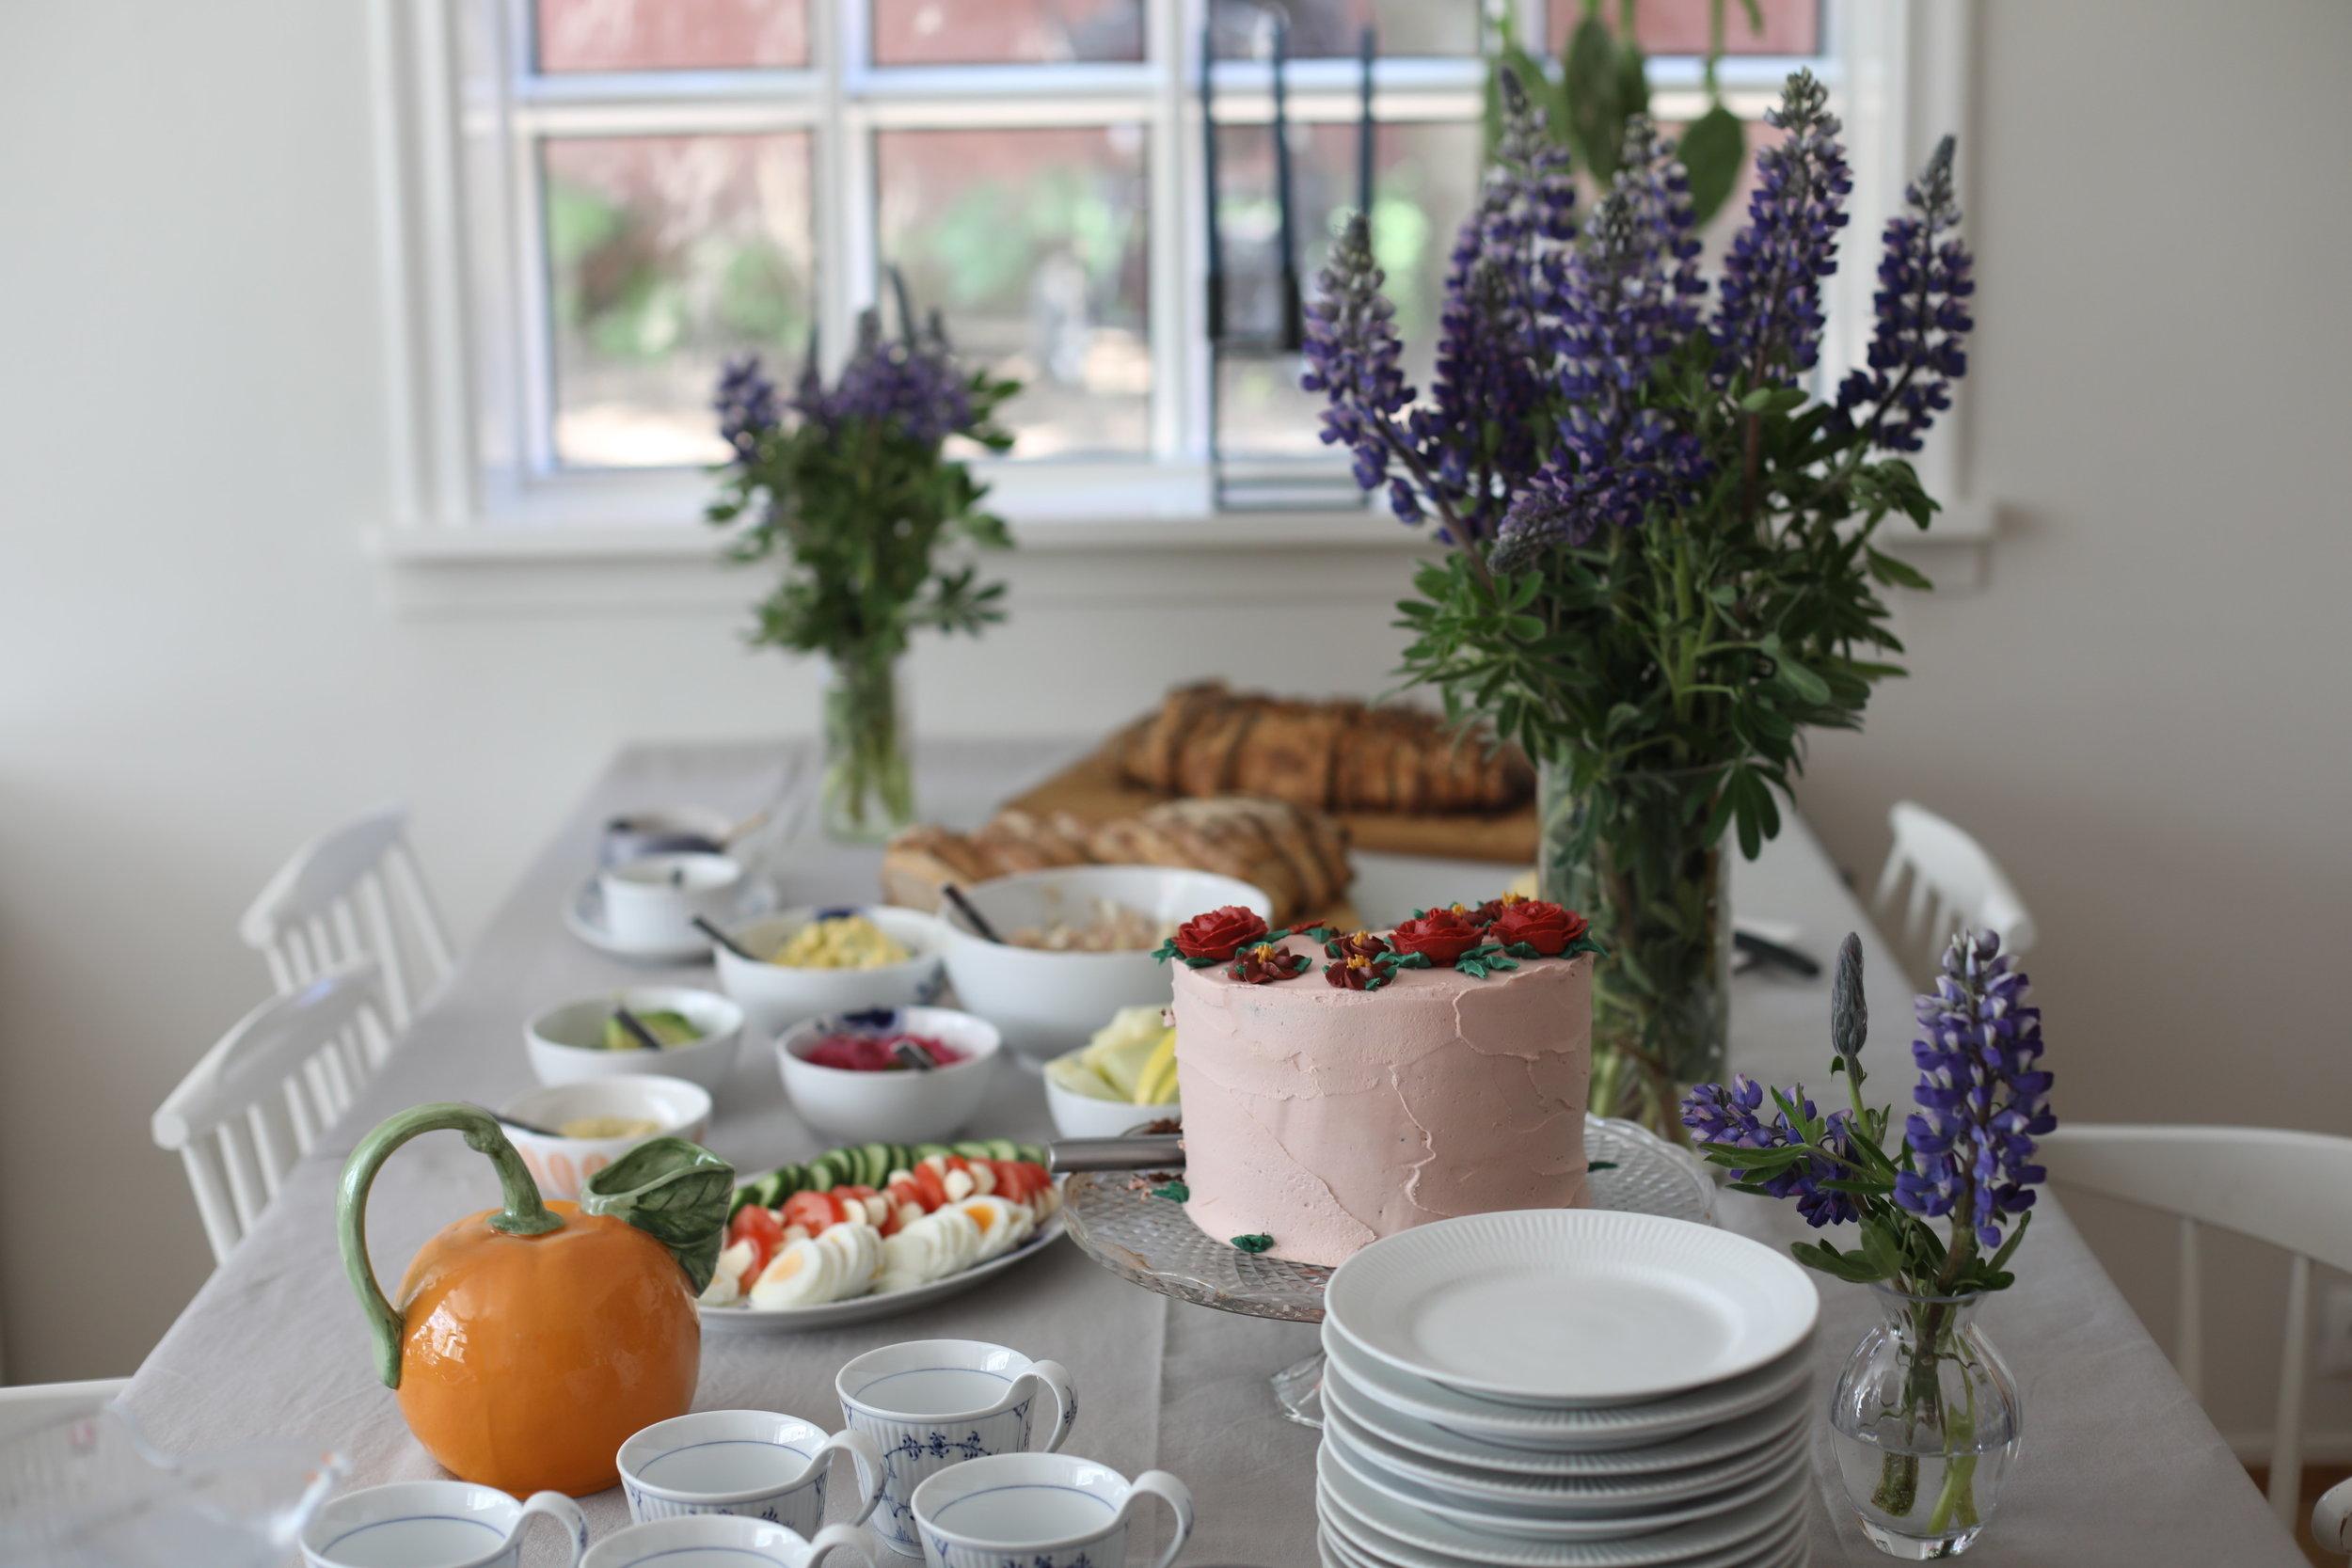 afmæli-birthday-brunch-cake-orange-dinner